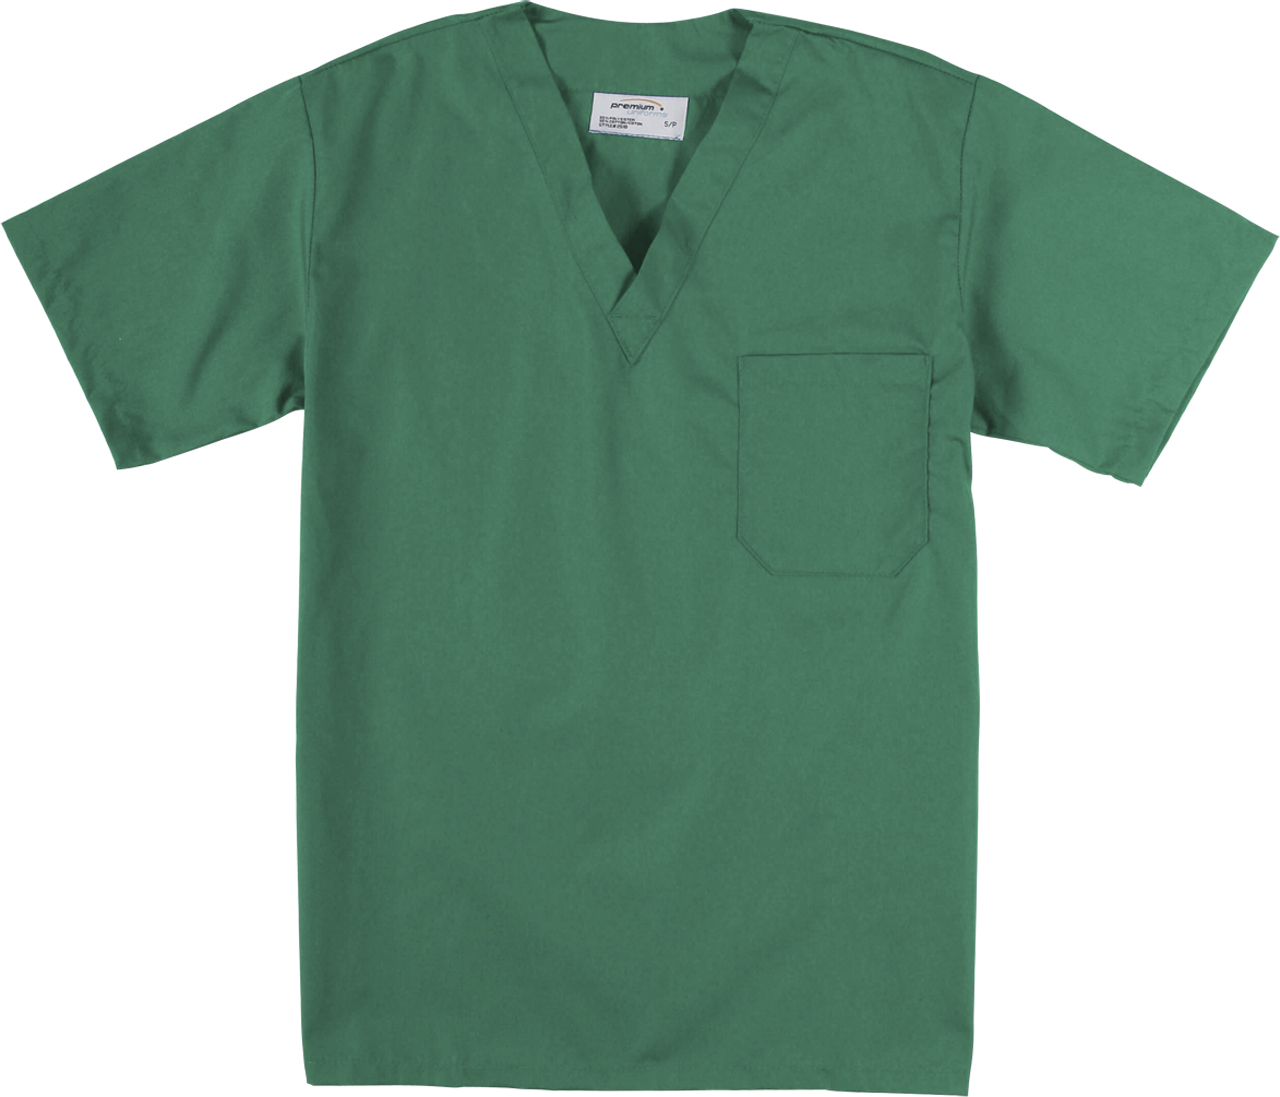 Picture of Premium Uniforms V-Neck Scrub Top